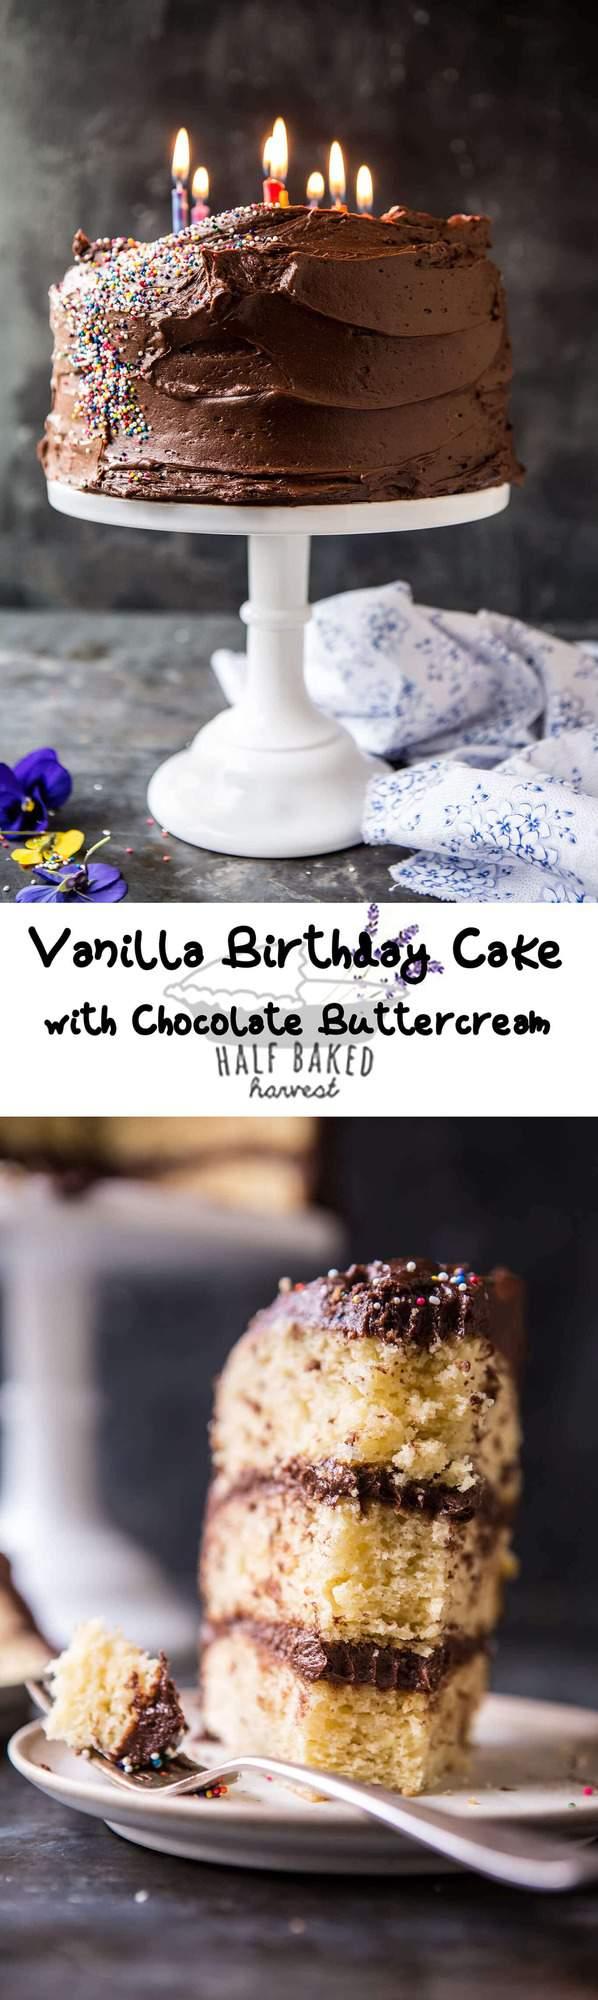 Vanilla Birthday Cake with Whipped Chocolate Buttercream   halfbakedharvest.com @hbharvest